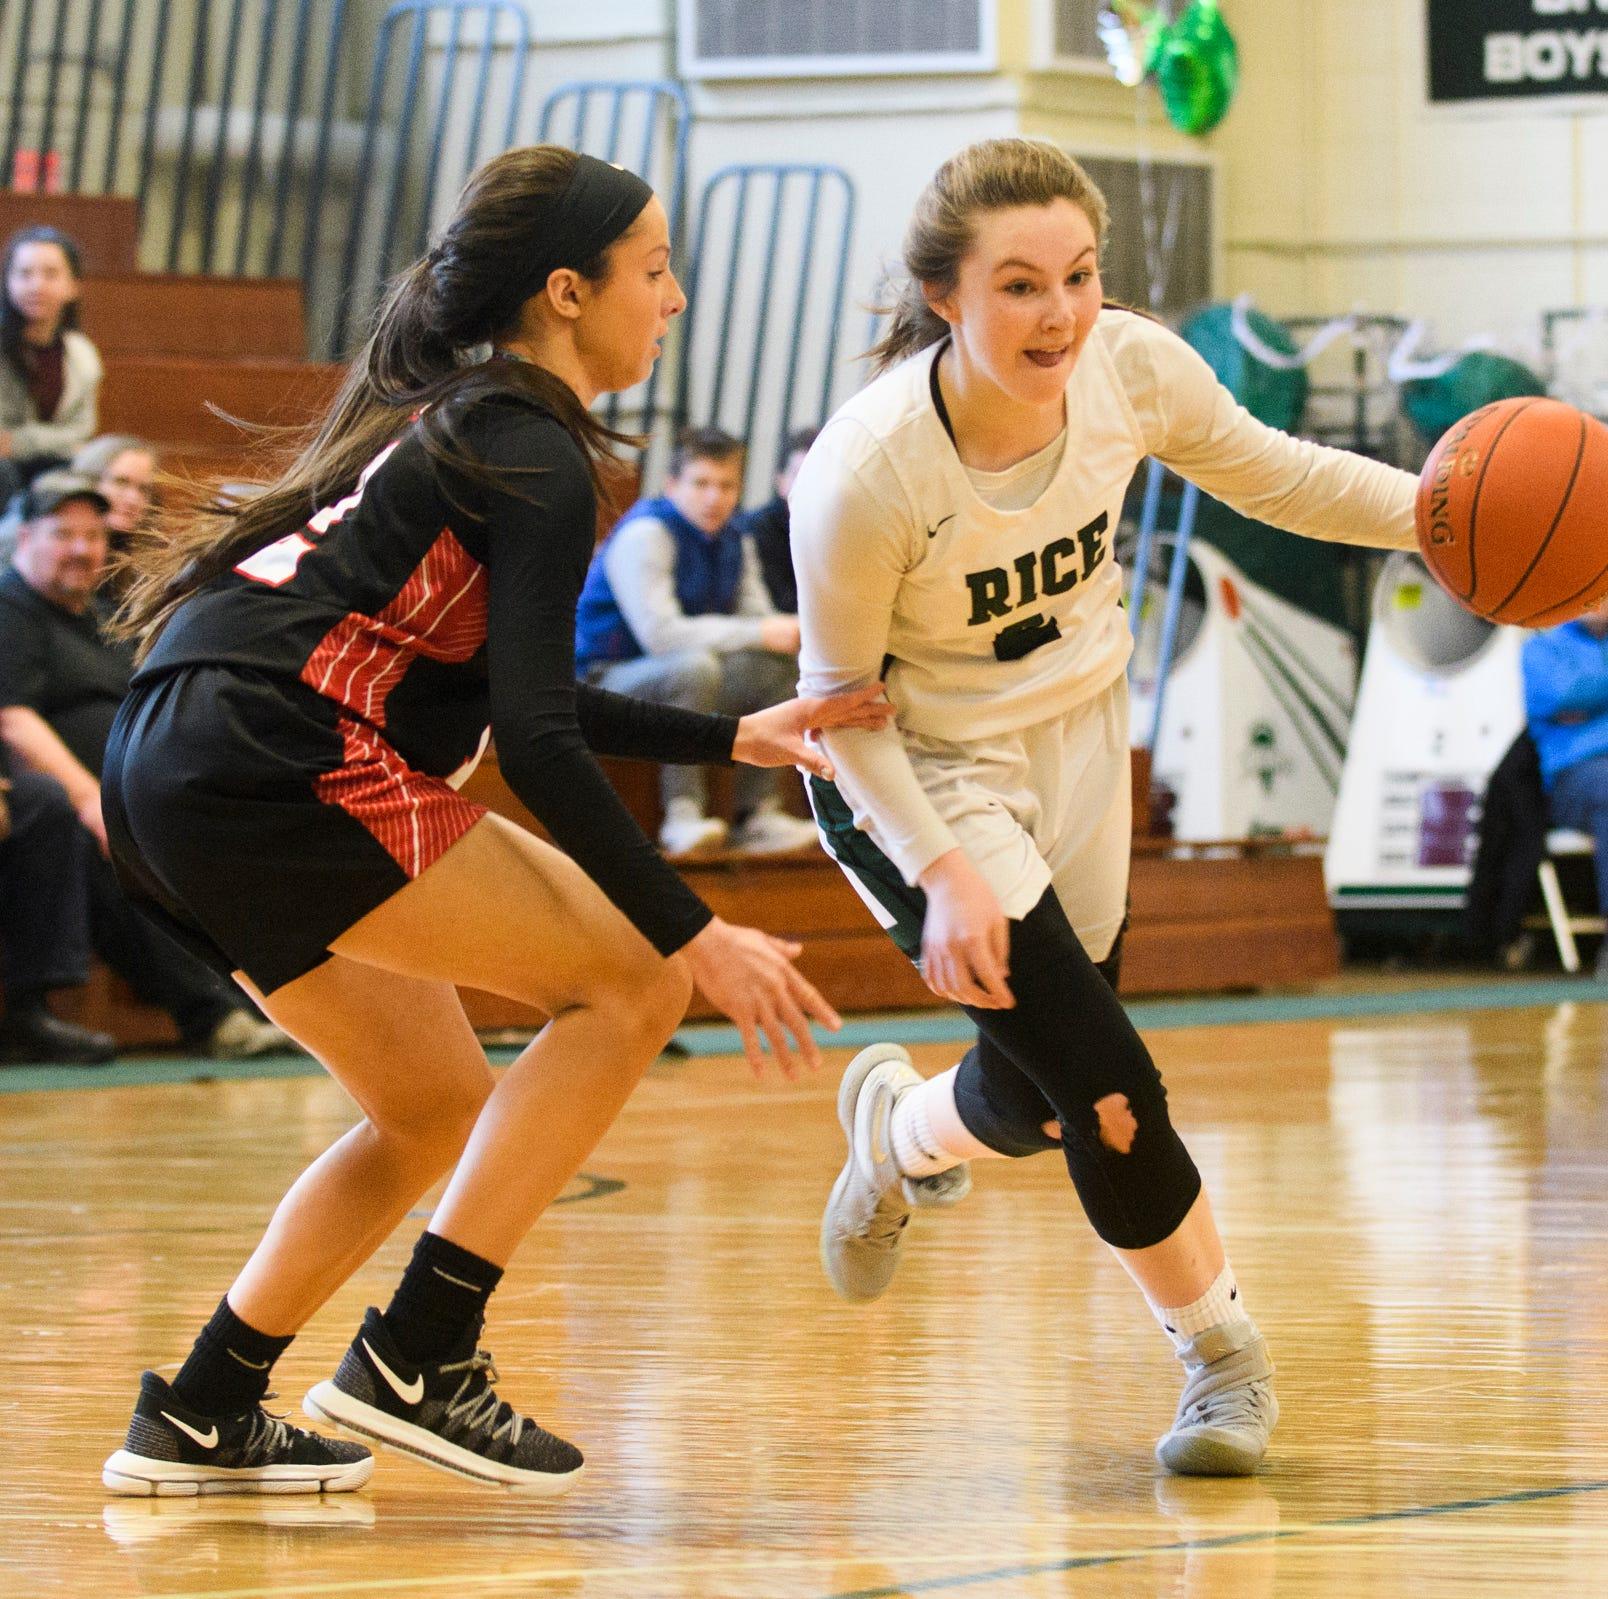 Vermont high school playoffs: Rice rallies to book Final Four trip